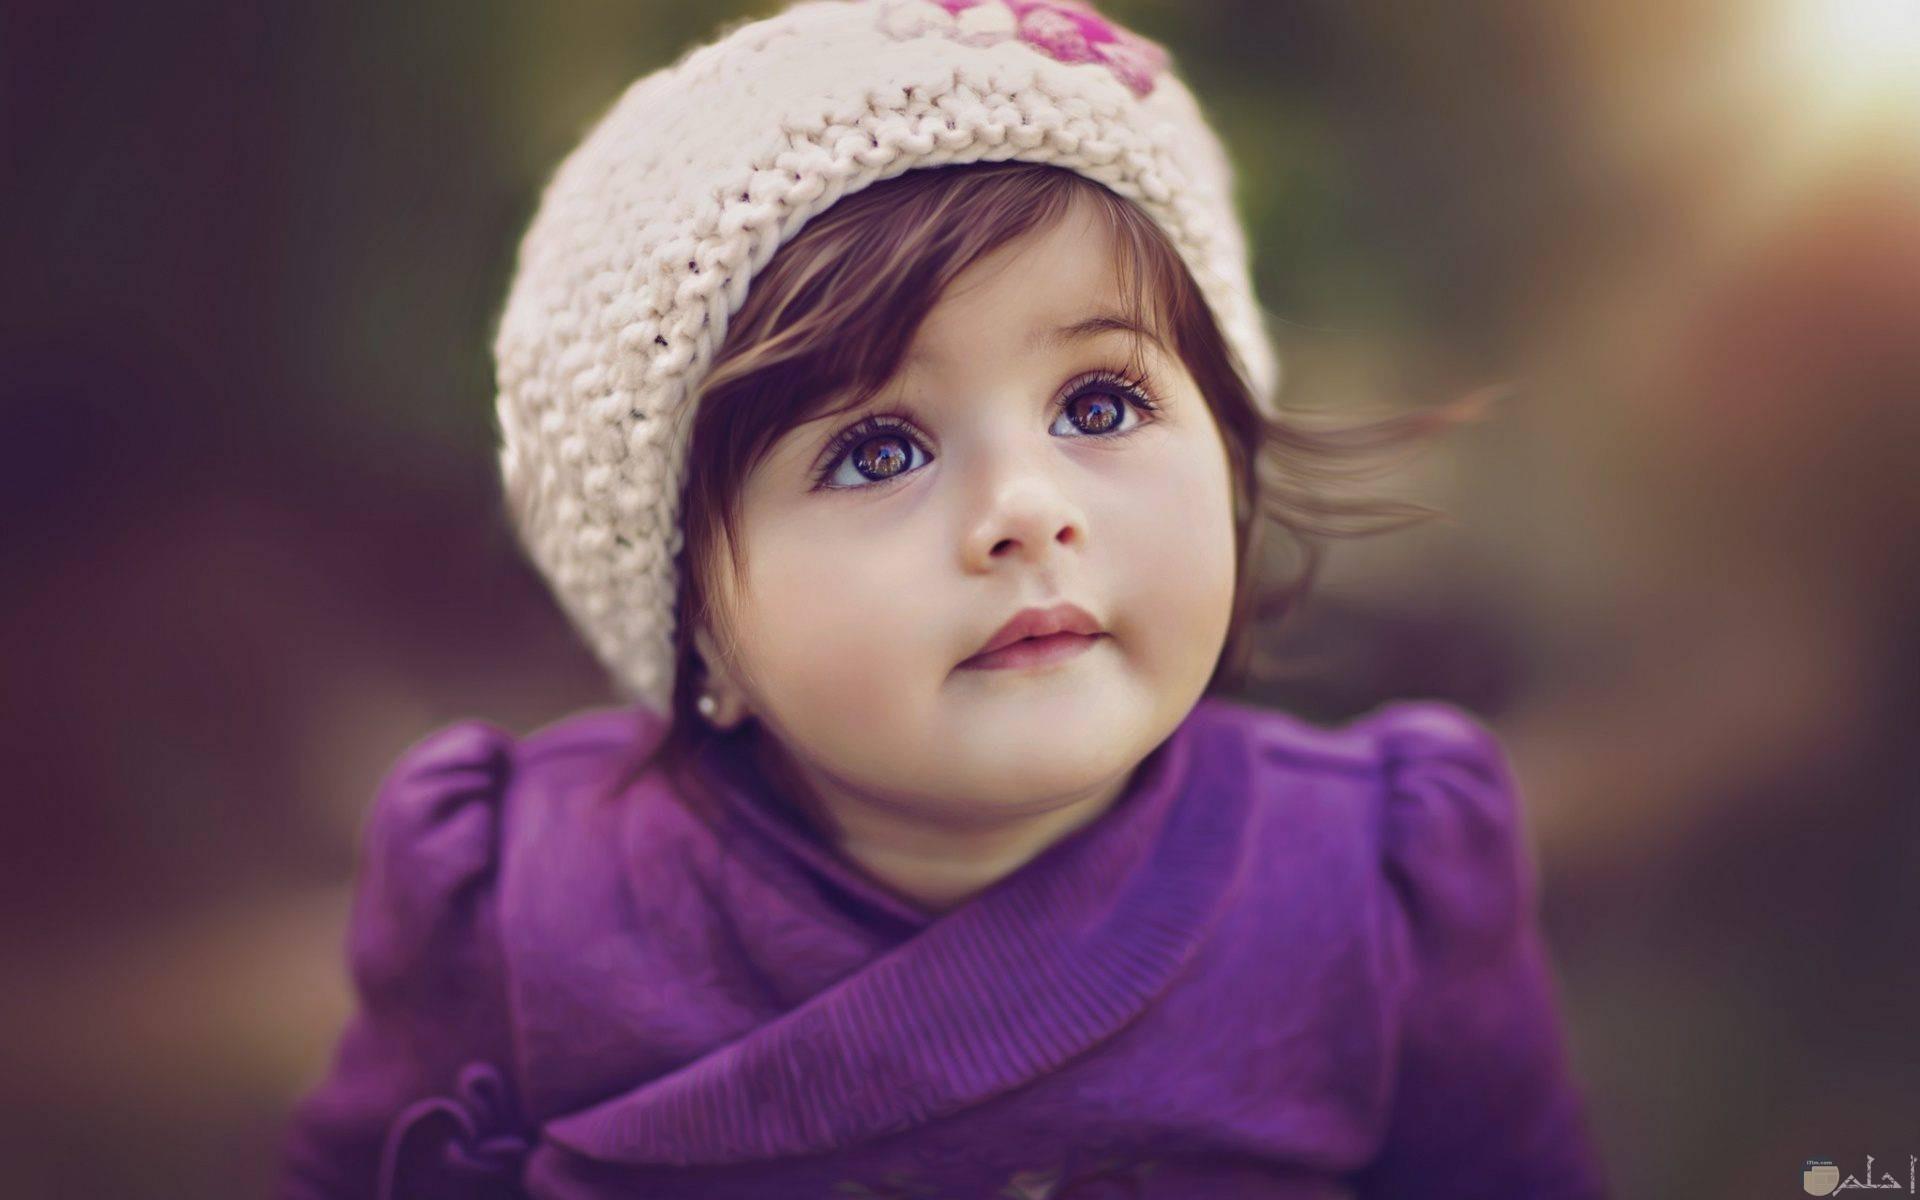 صور اطفال صور بيبي صور اولاد صور حلوين اطفال حلوينصور اطفال صغار2020 71